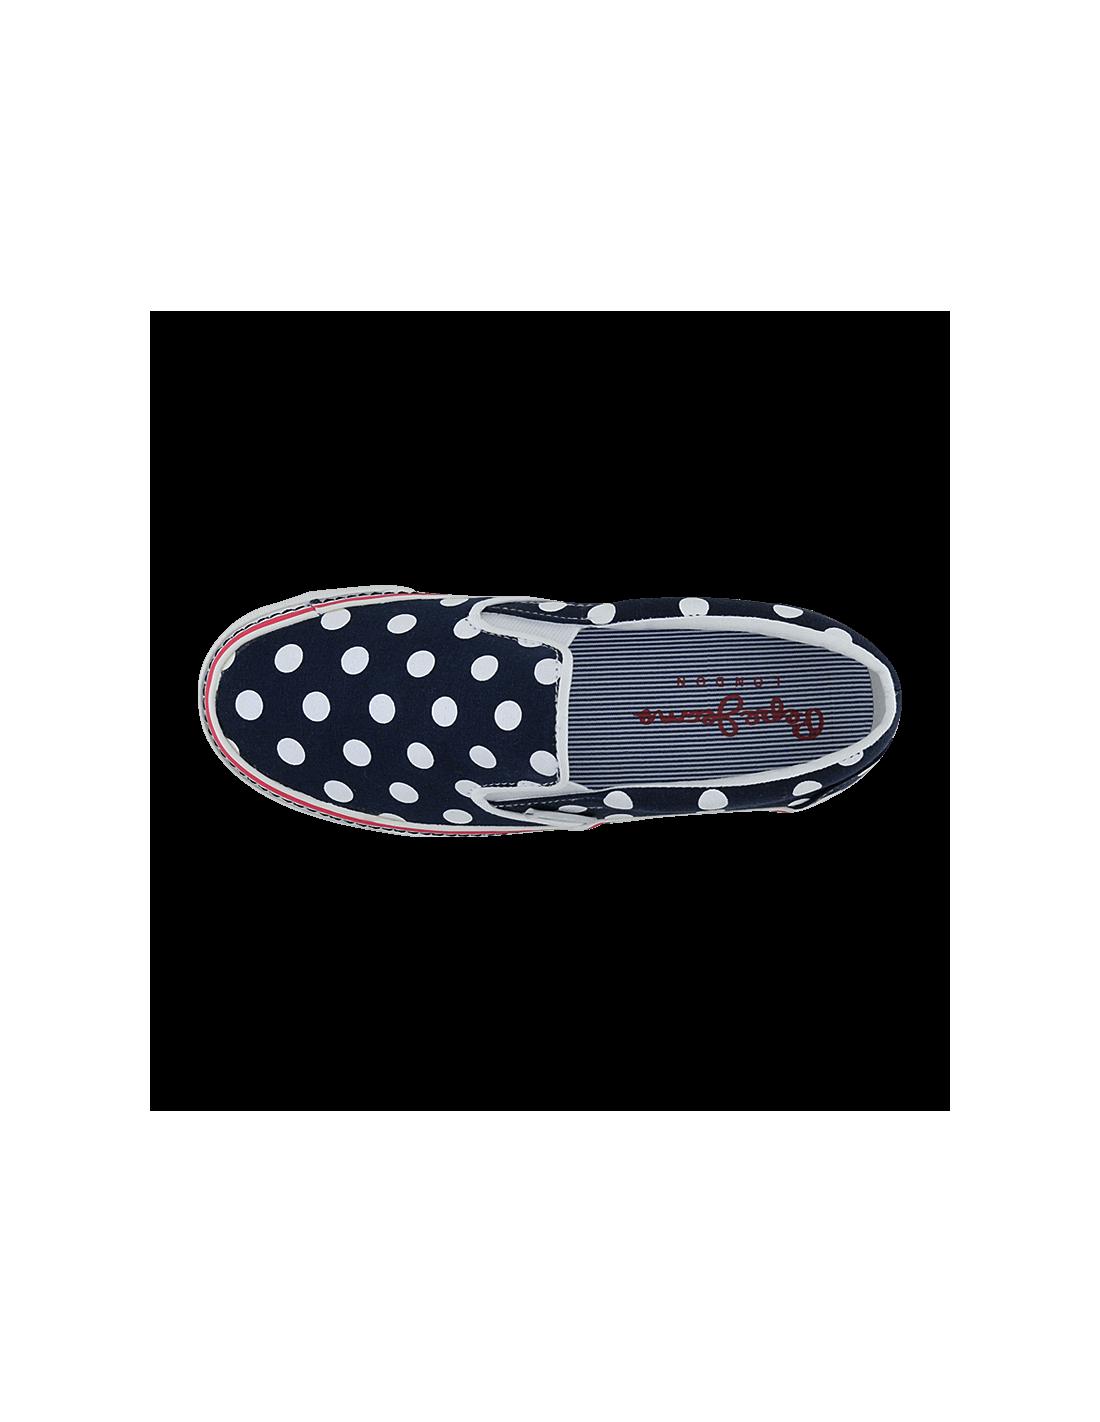 6b838cd8872 ... Pepe Jeans Γυναικεια Sneakers pls30146 Castiello Μπλέ Πουά ...